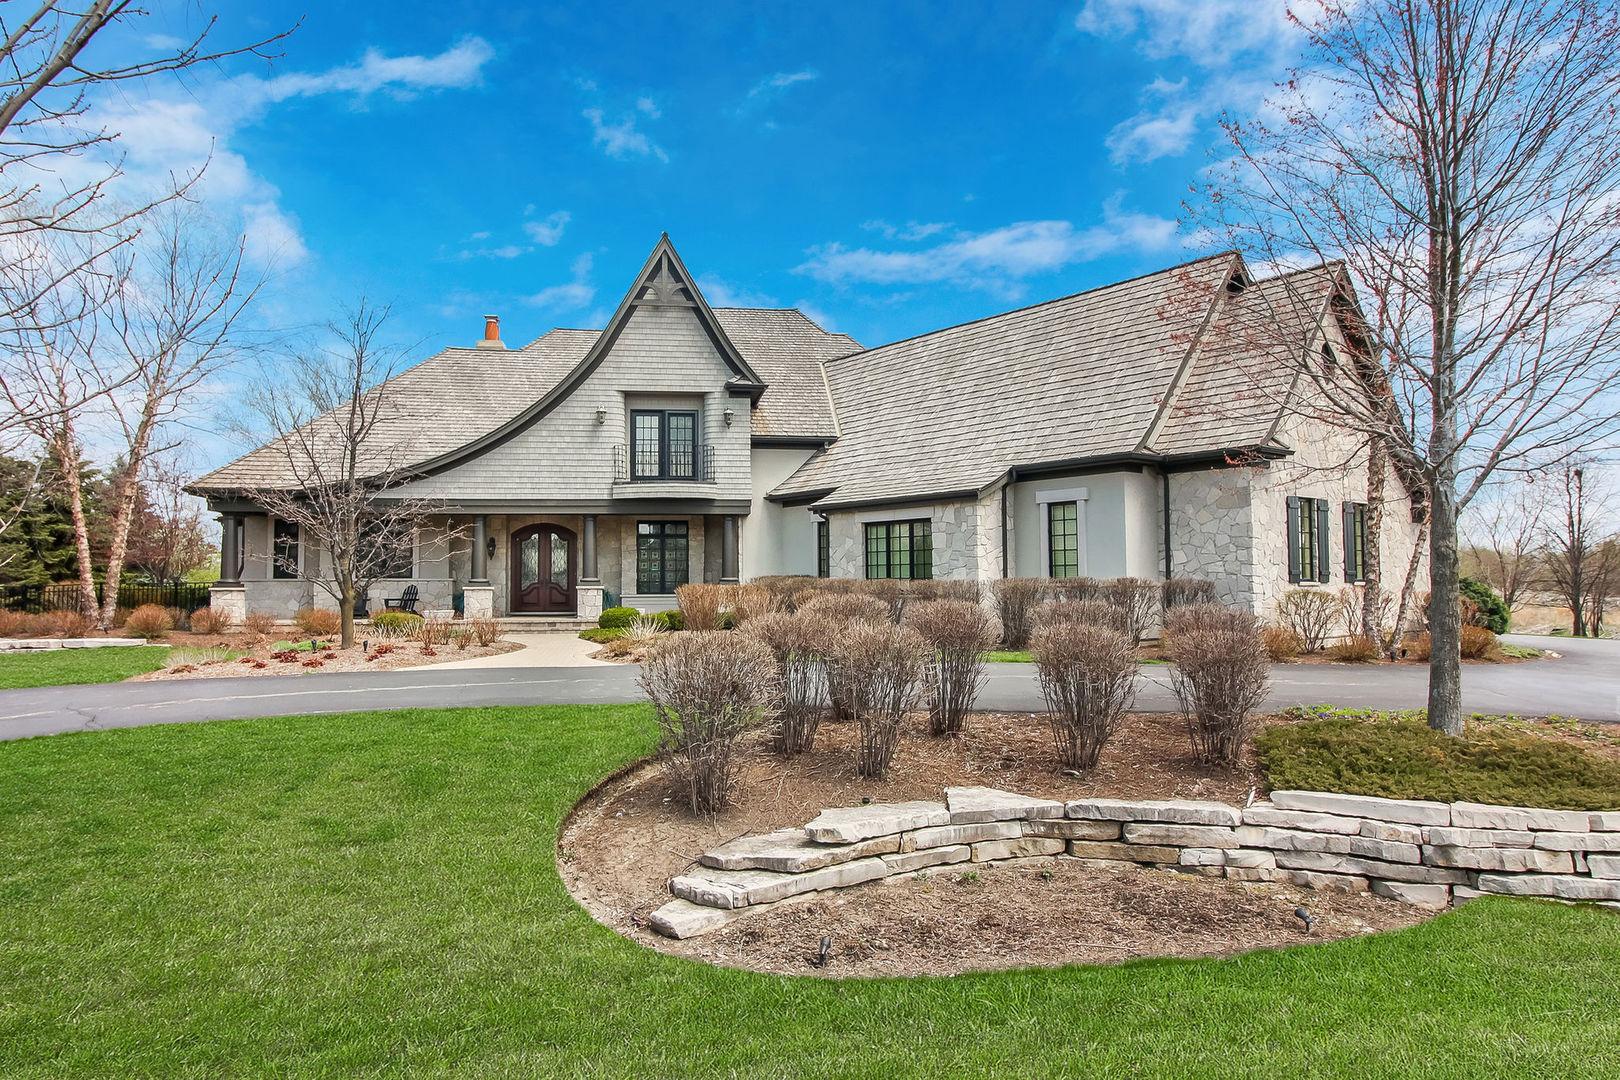 4926 Thimbleweed Court, Long Grove, Illinois 60047